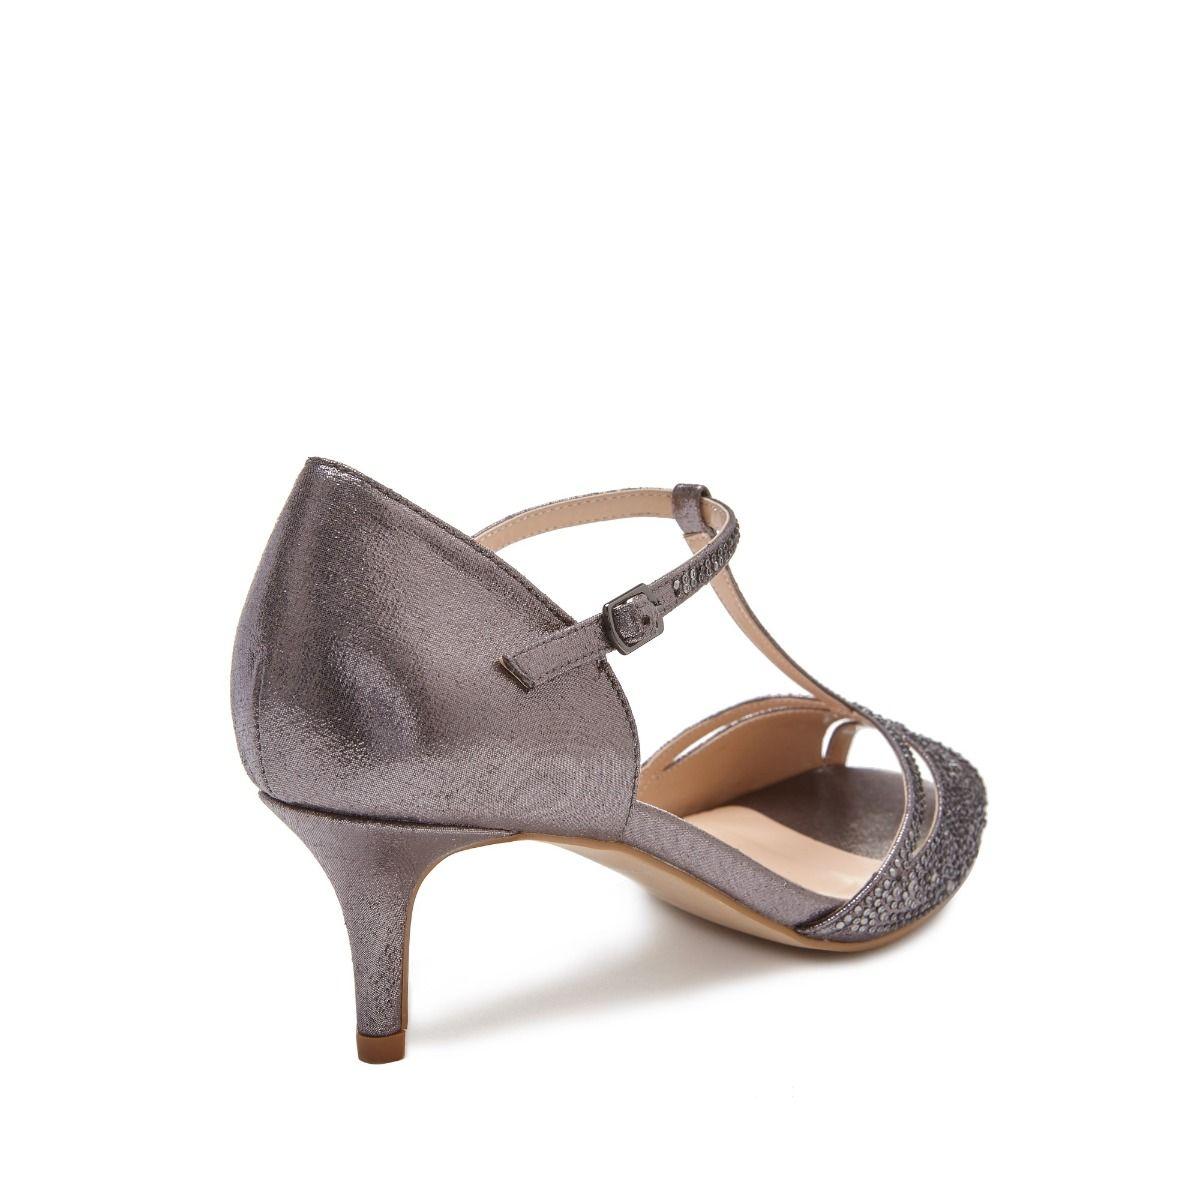 Pewter Heels For Wedding: Low Heel Pewter Shimmer Sandal